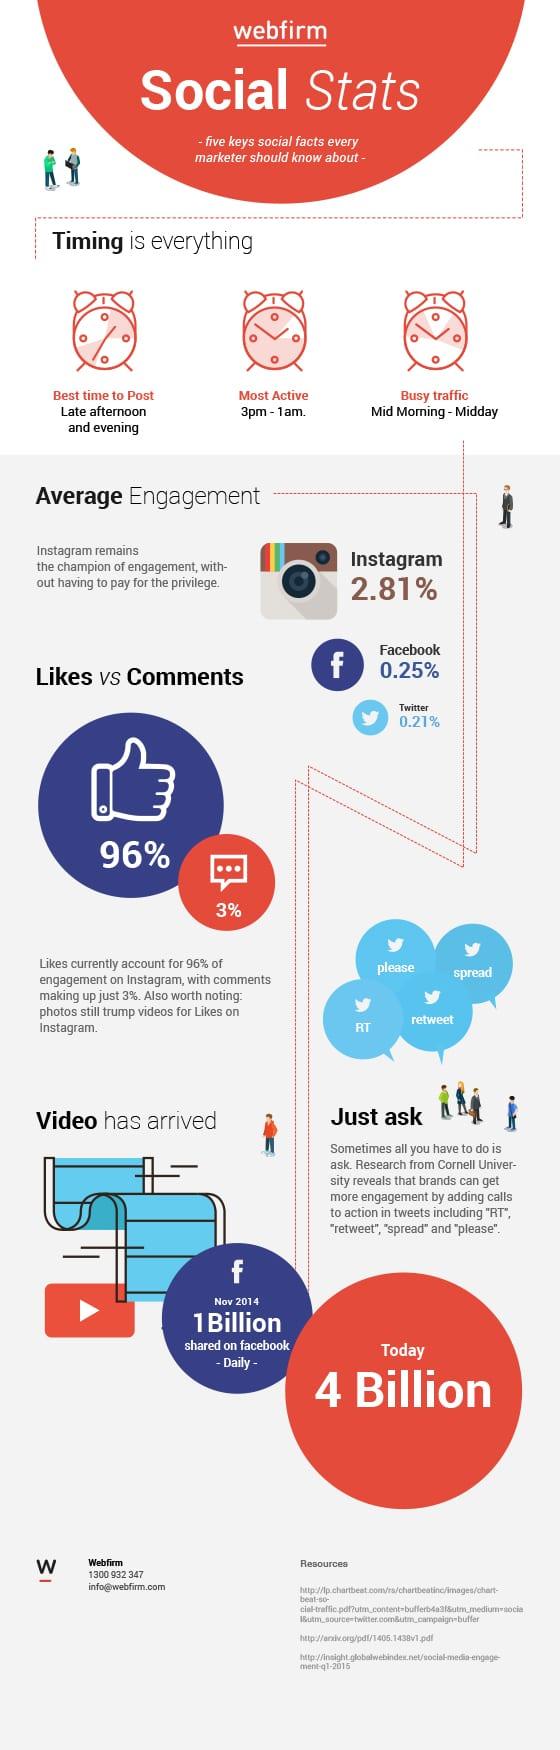 social media statistics - Webfirm Melbourne digital marketing agency